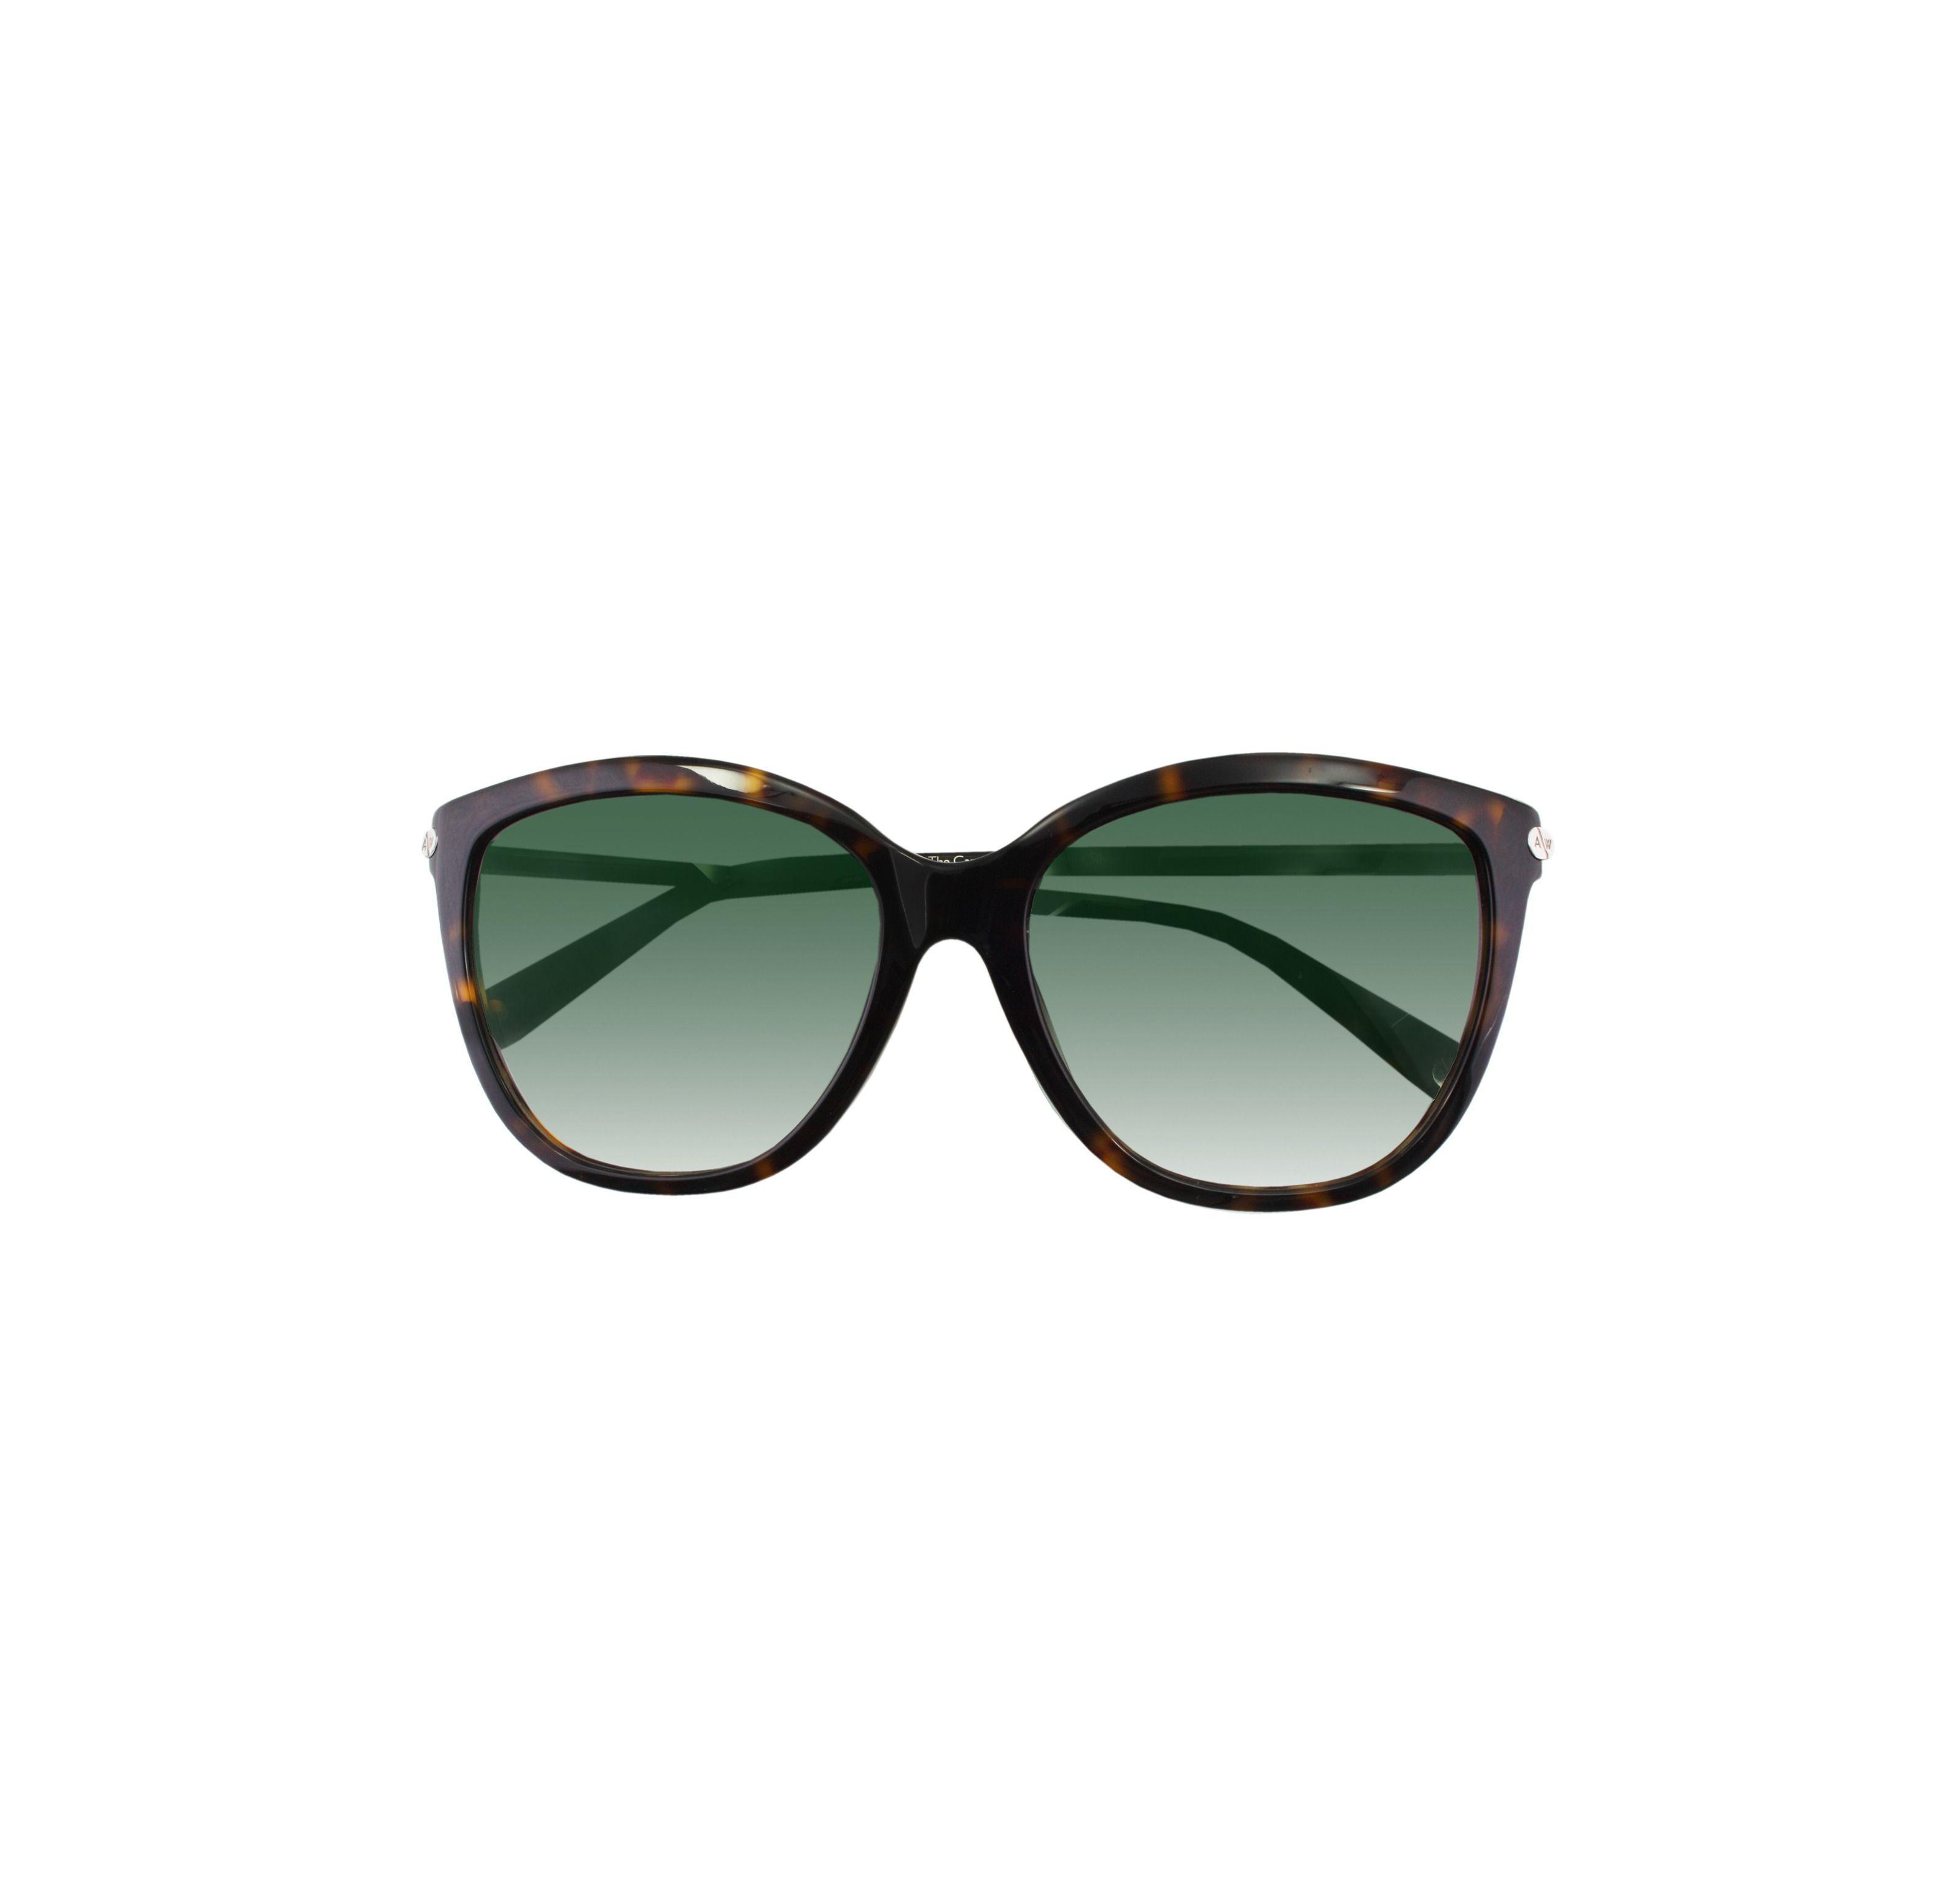 d9381ffb97 Lyst - Amanda Wakeley The Carnaby Tortoiseshell Sunglasses in Green